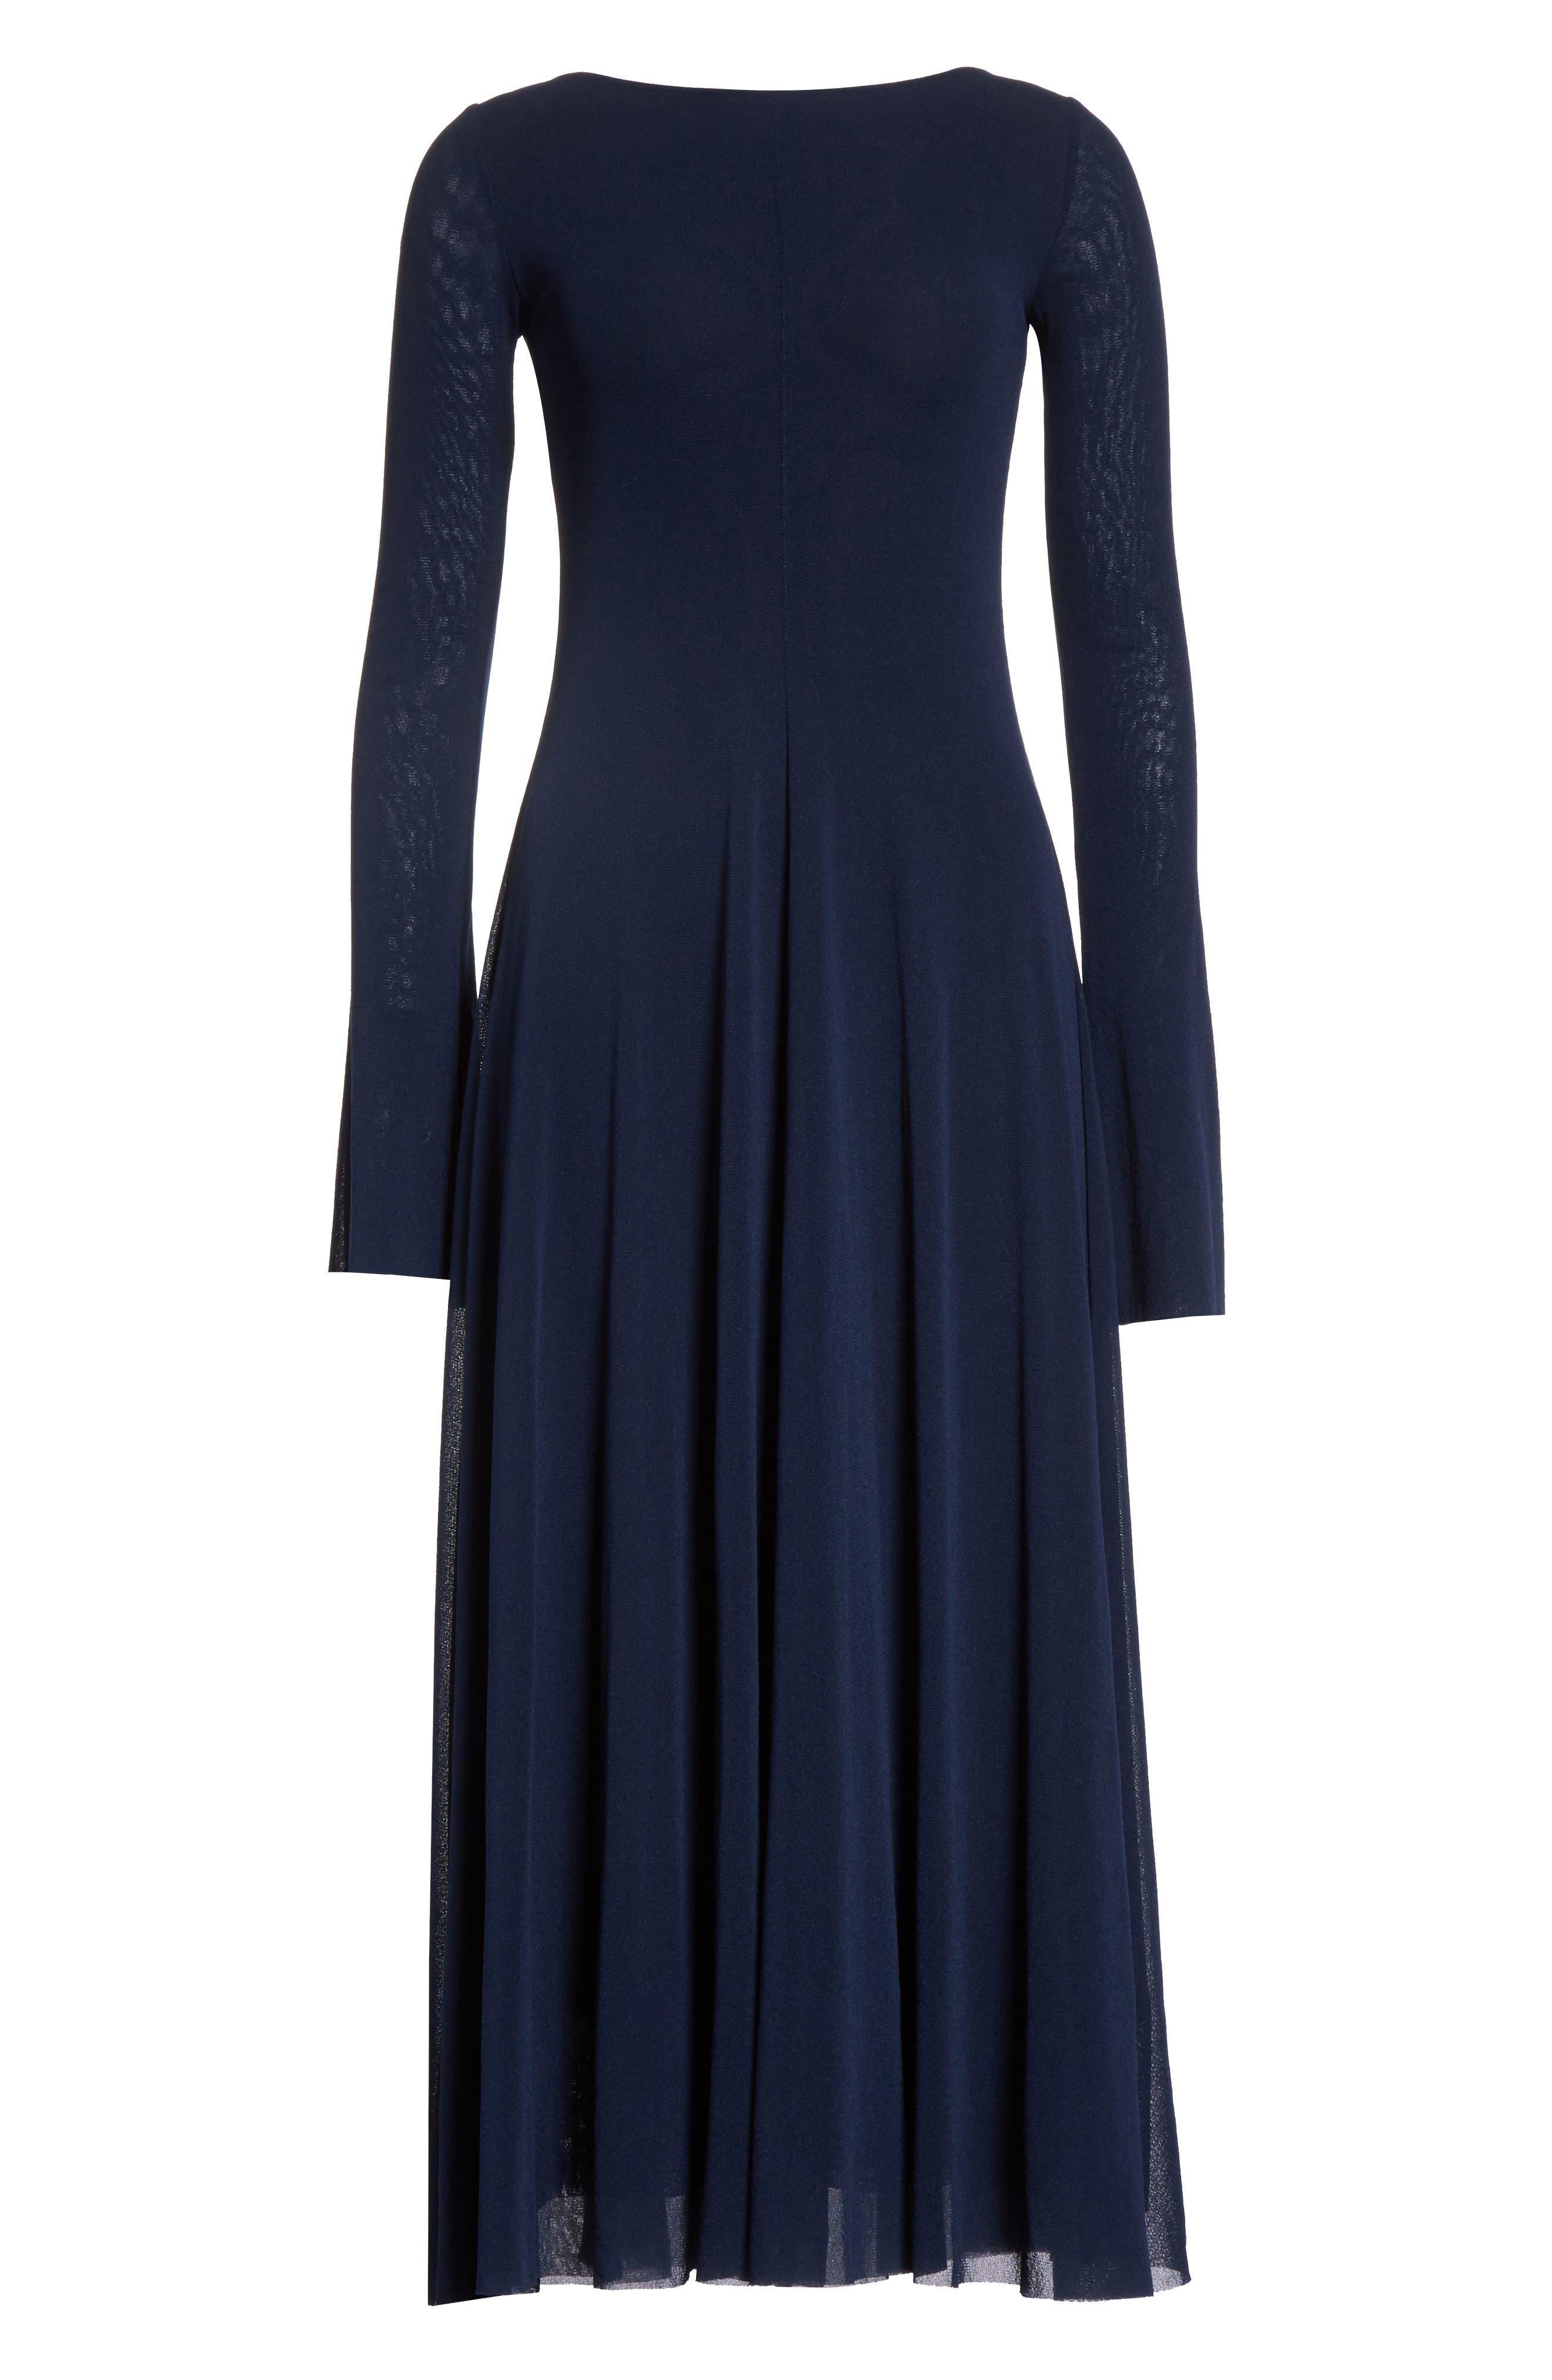 Reversible Tulle Dress,                             Alternate thumbnail 6, color,                             001